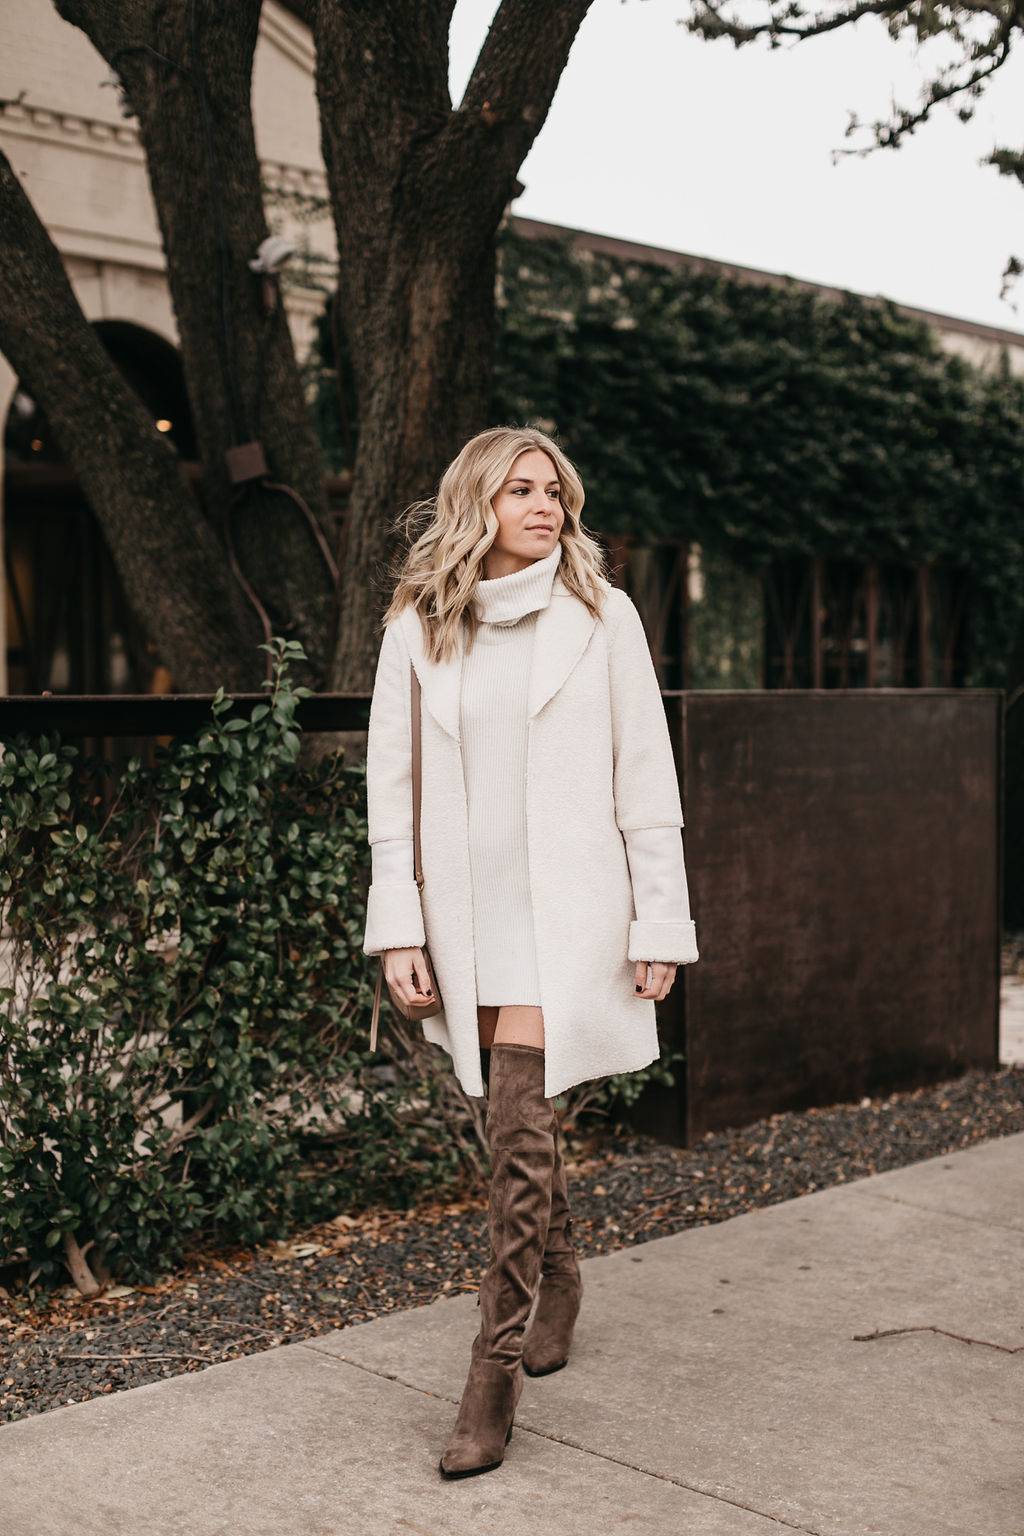 WINTER WHITE COAT - ONE SMALL BLONDE